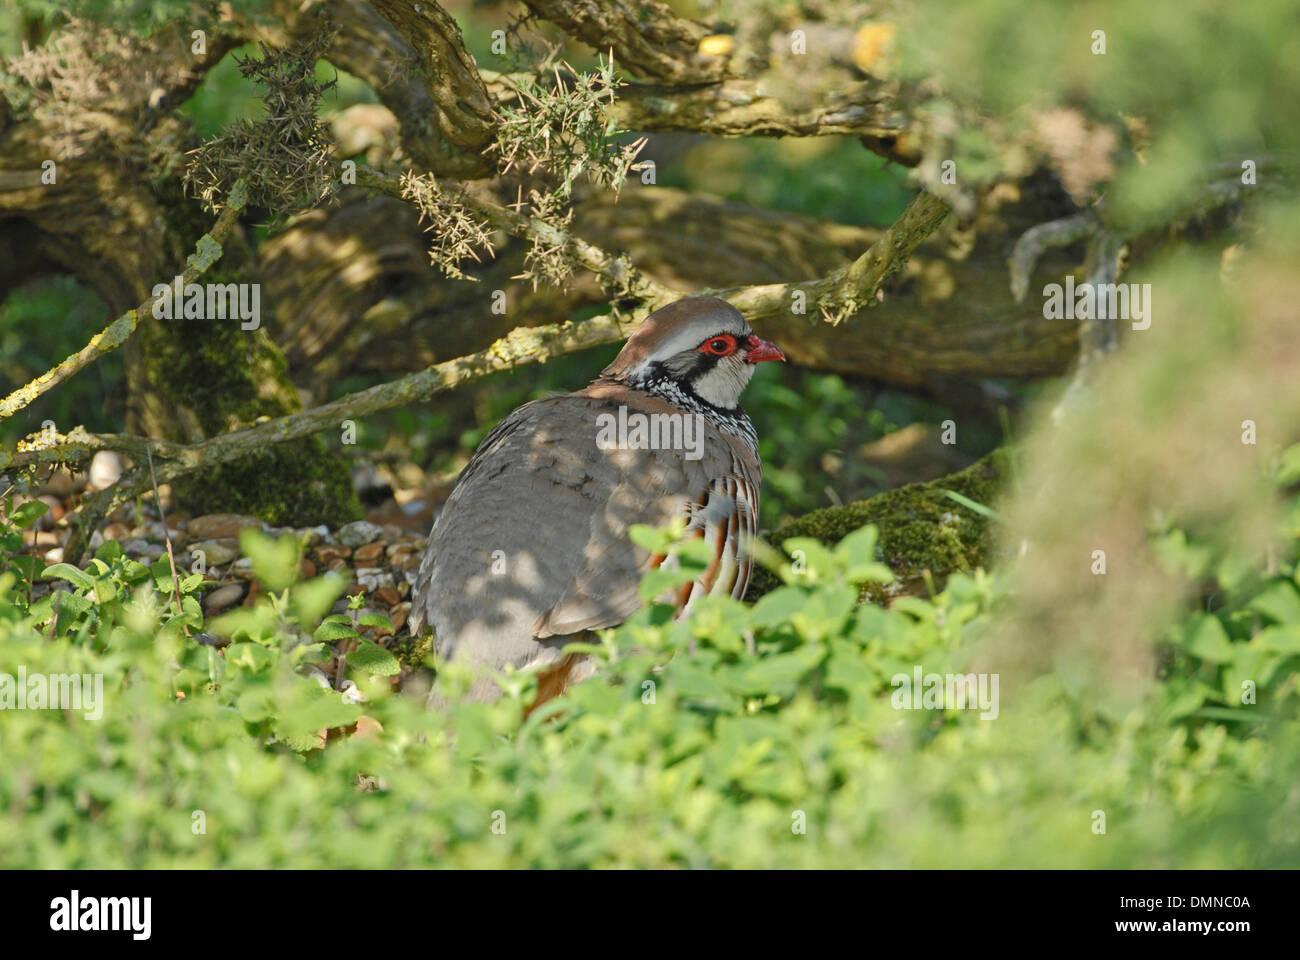 Red-legged partridge (Alectoris rufa) sheltering under hedge - Stock Image